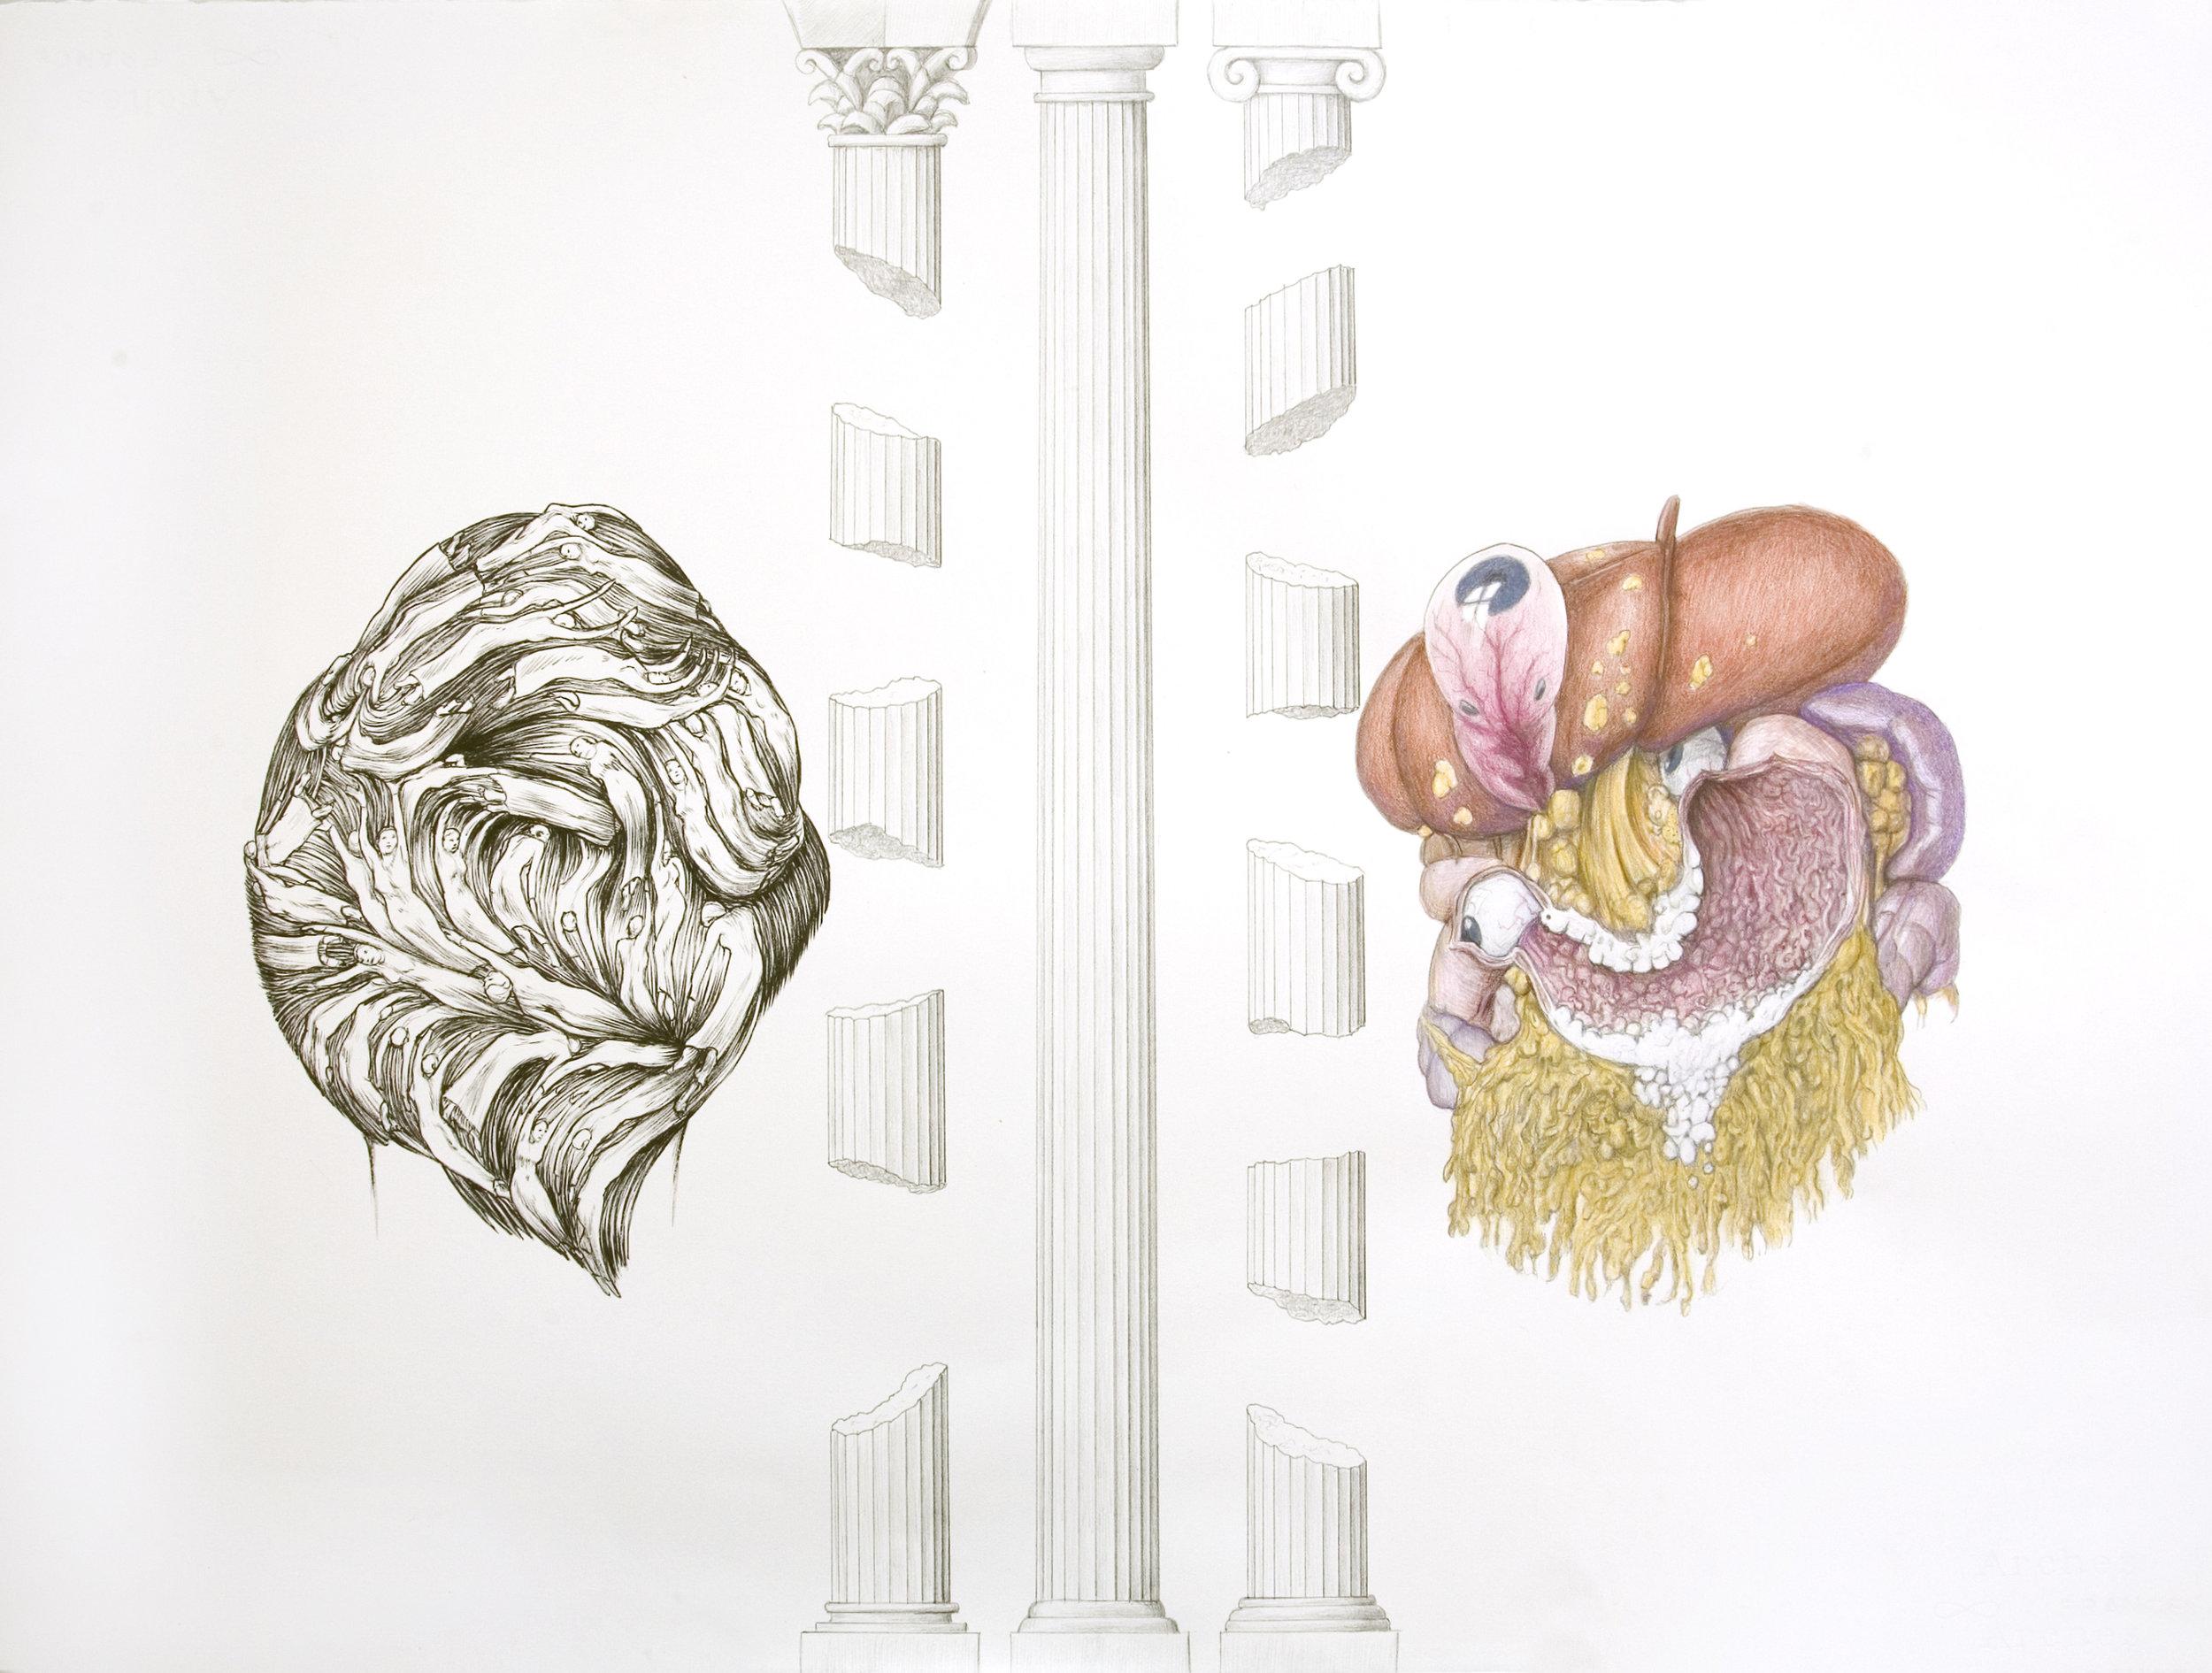 Anatomy Weird-ohs (Blake Hair-do; 3 Columns & Beatnik fetus face), 2011 gouache, pencil and watercolor on paper 56,8 x 76,2 cm - 22 3/8 x 30 inches